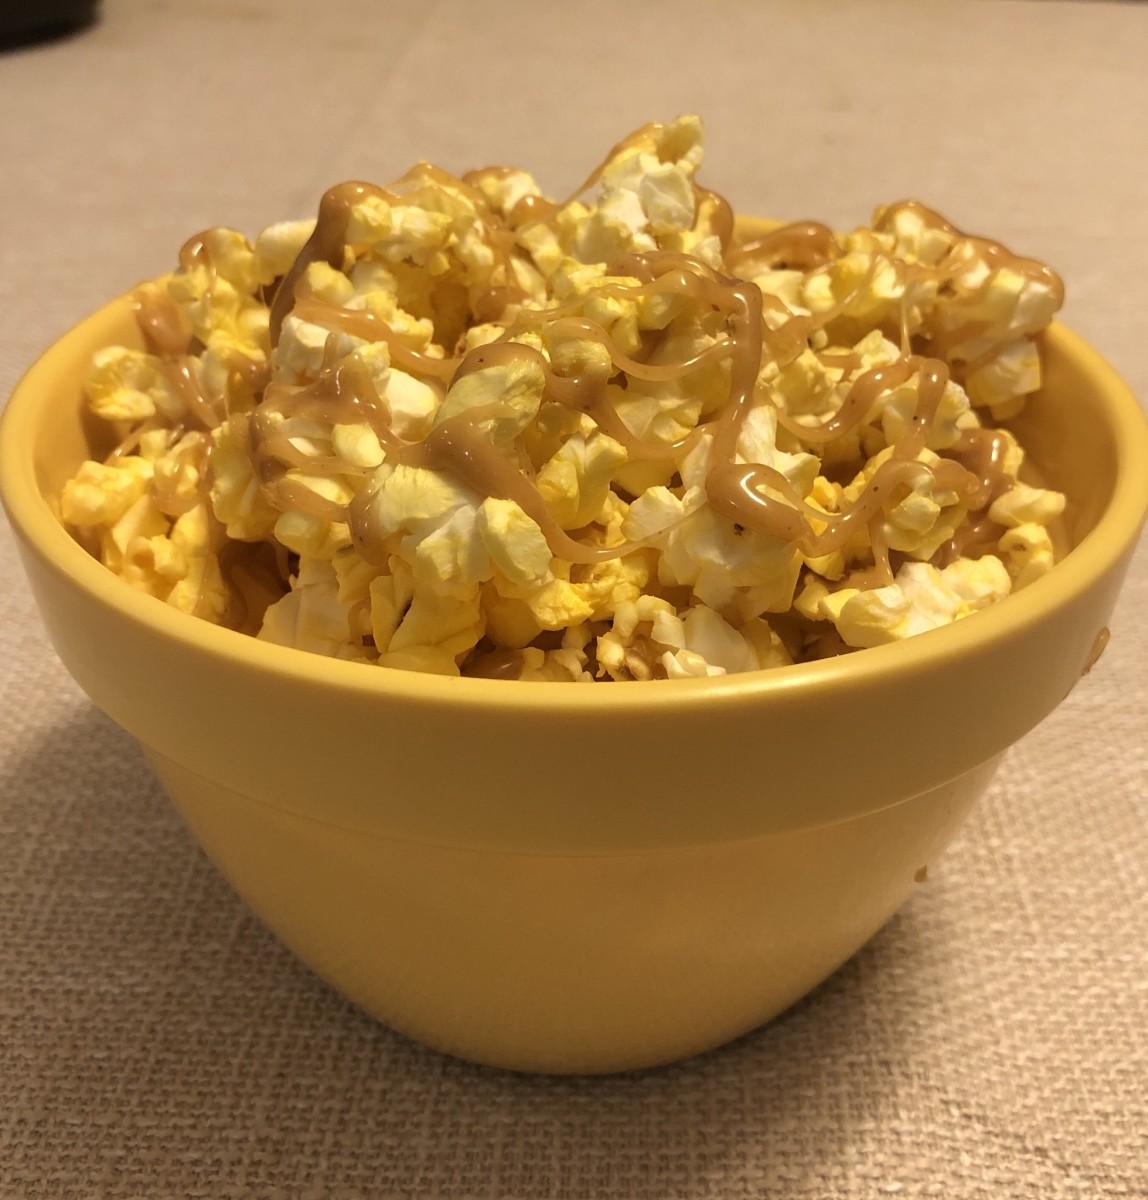 Peanut butter caramel popcorn.